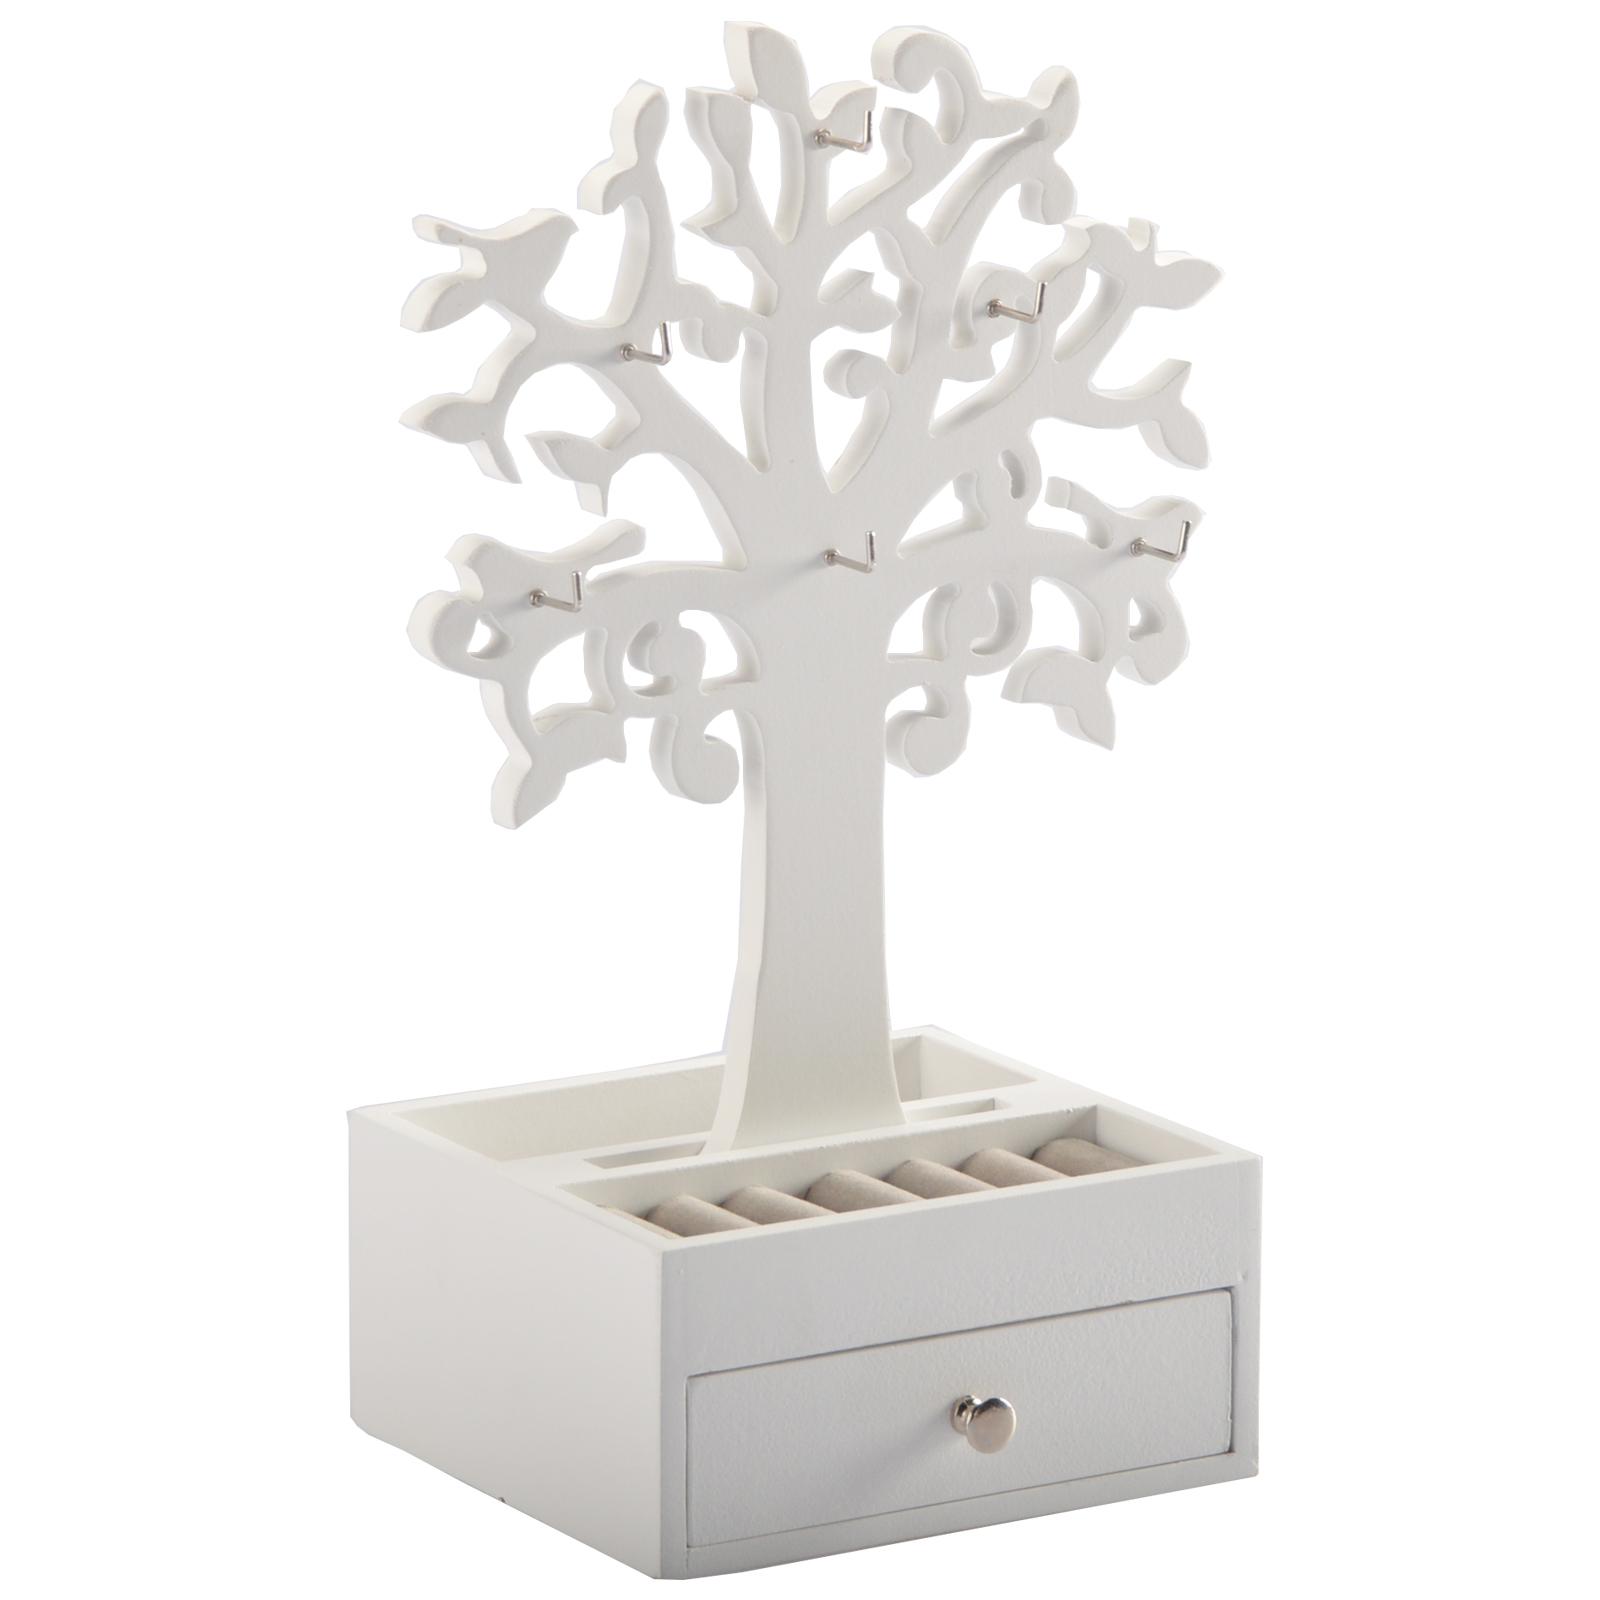 schmuckkasten abnehmbahrer schmuckbaum schmuckst nder. Black Bedroom Furniture Sets. Home Design Ideas